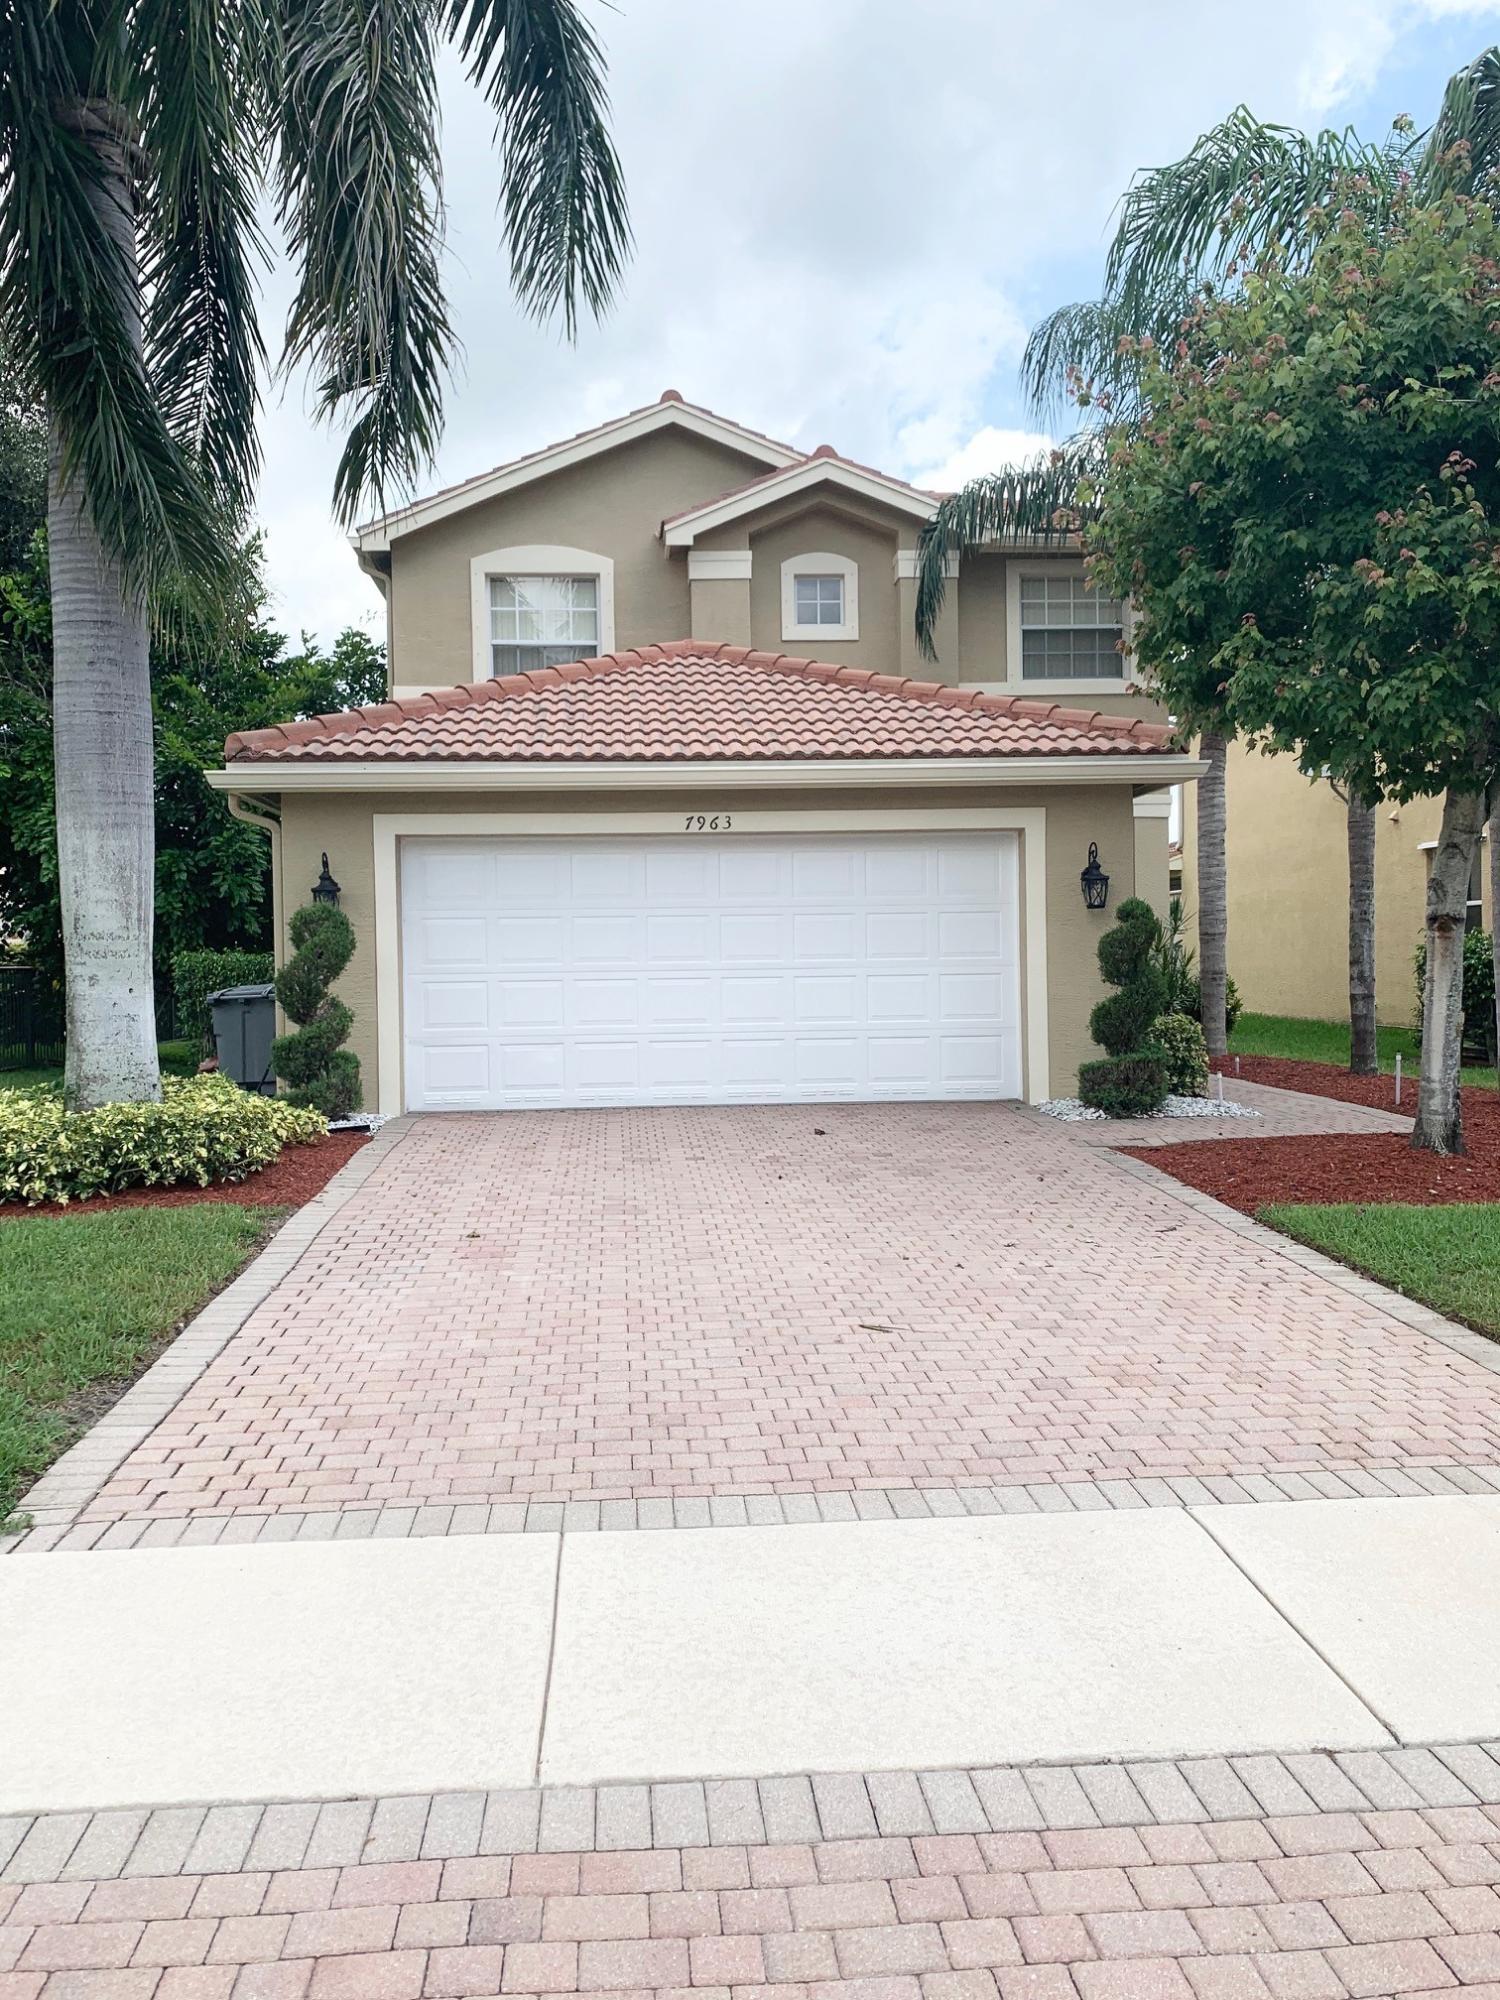 Home for sale in Greystone Boynton Beach Florida